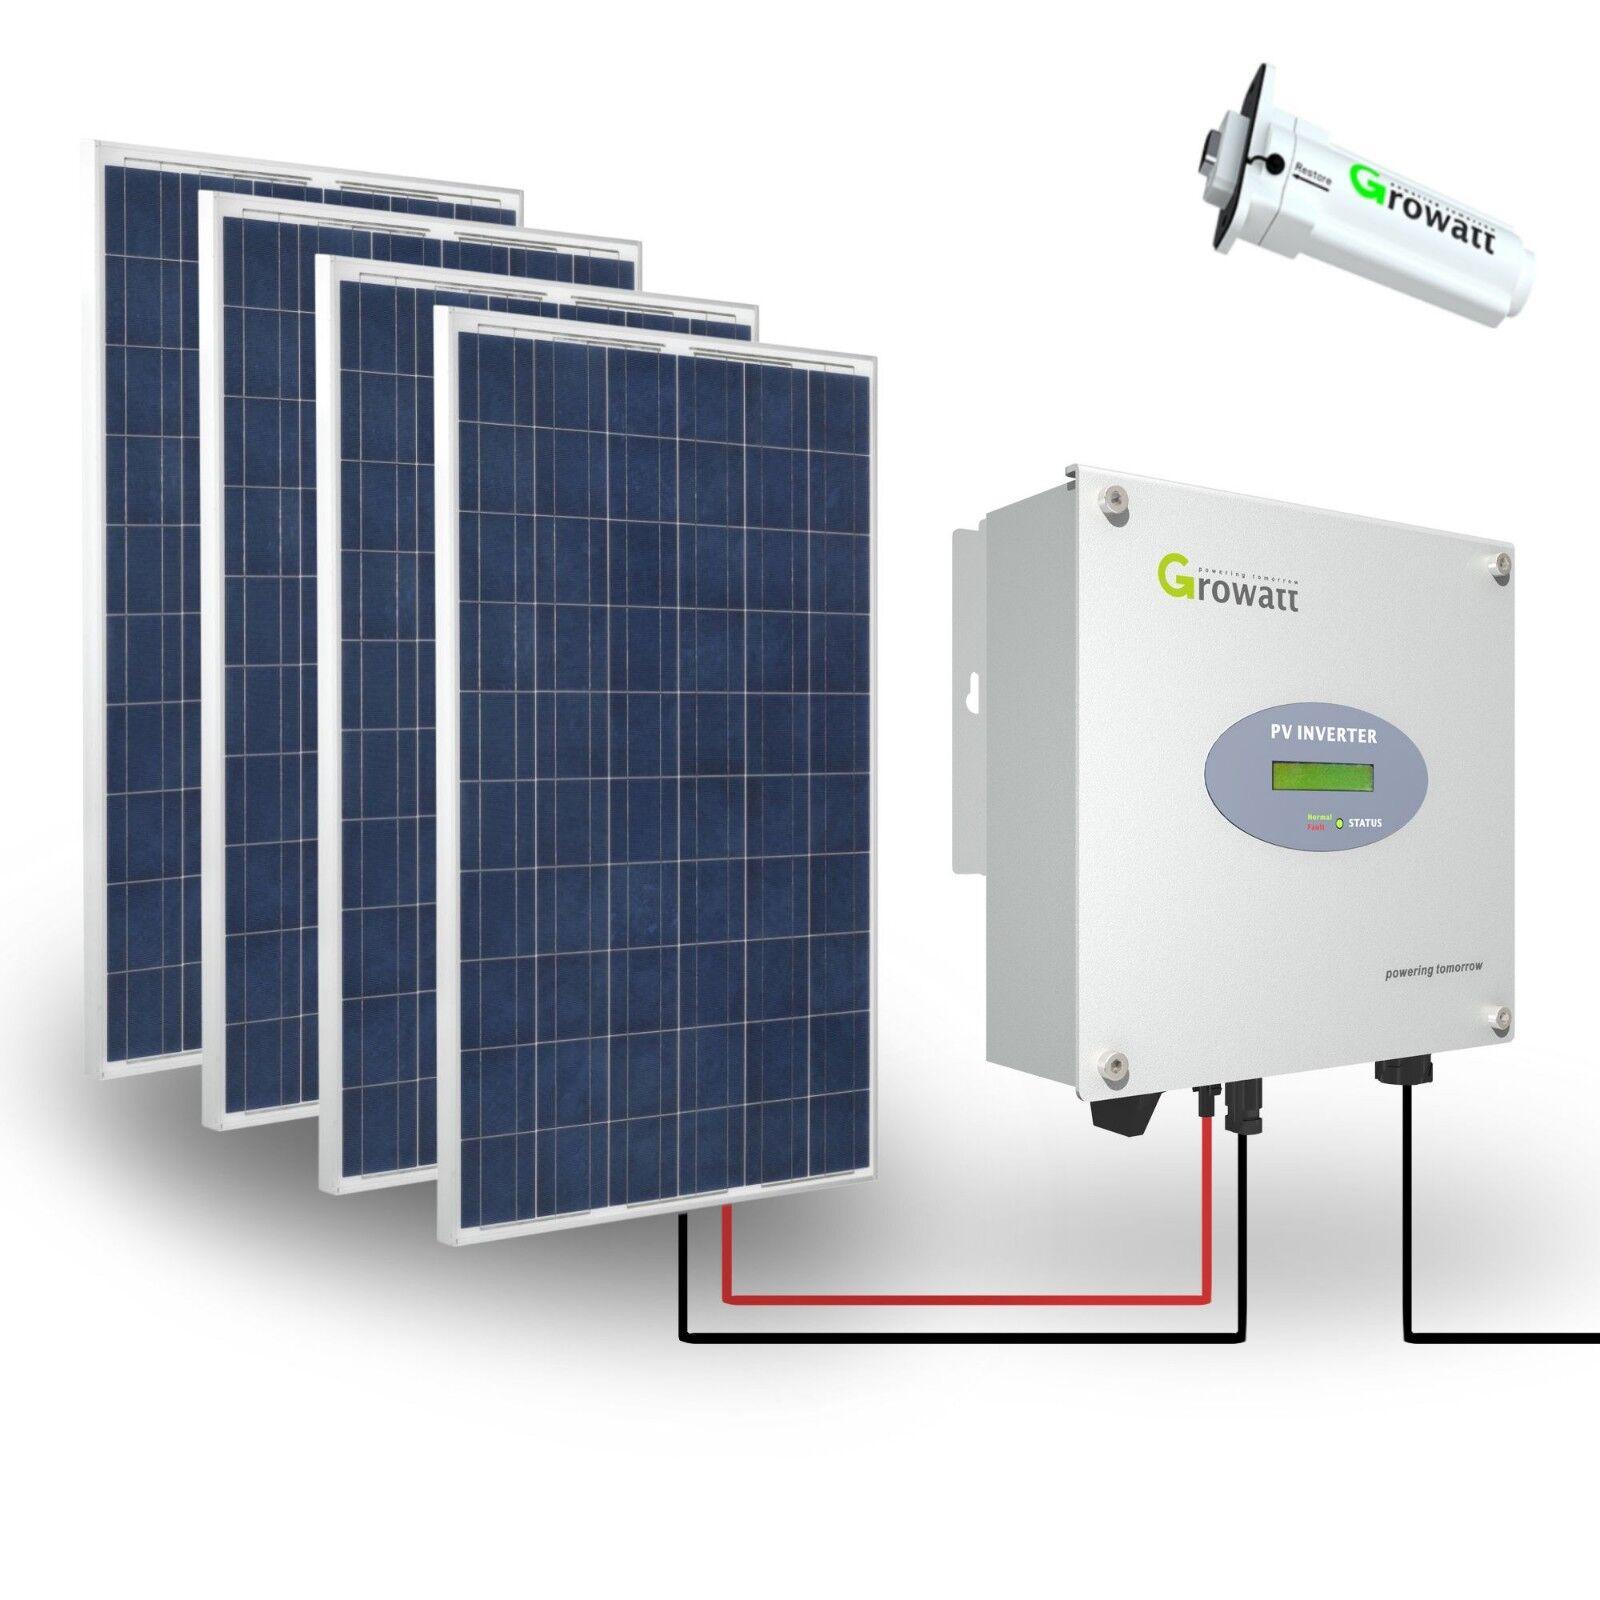 1000w Solaranlage Komplettpaket 220v 4x Akku 280ah Solarpanel 2000w Watt 24v Erneuerbare Energie